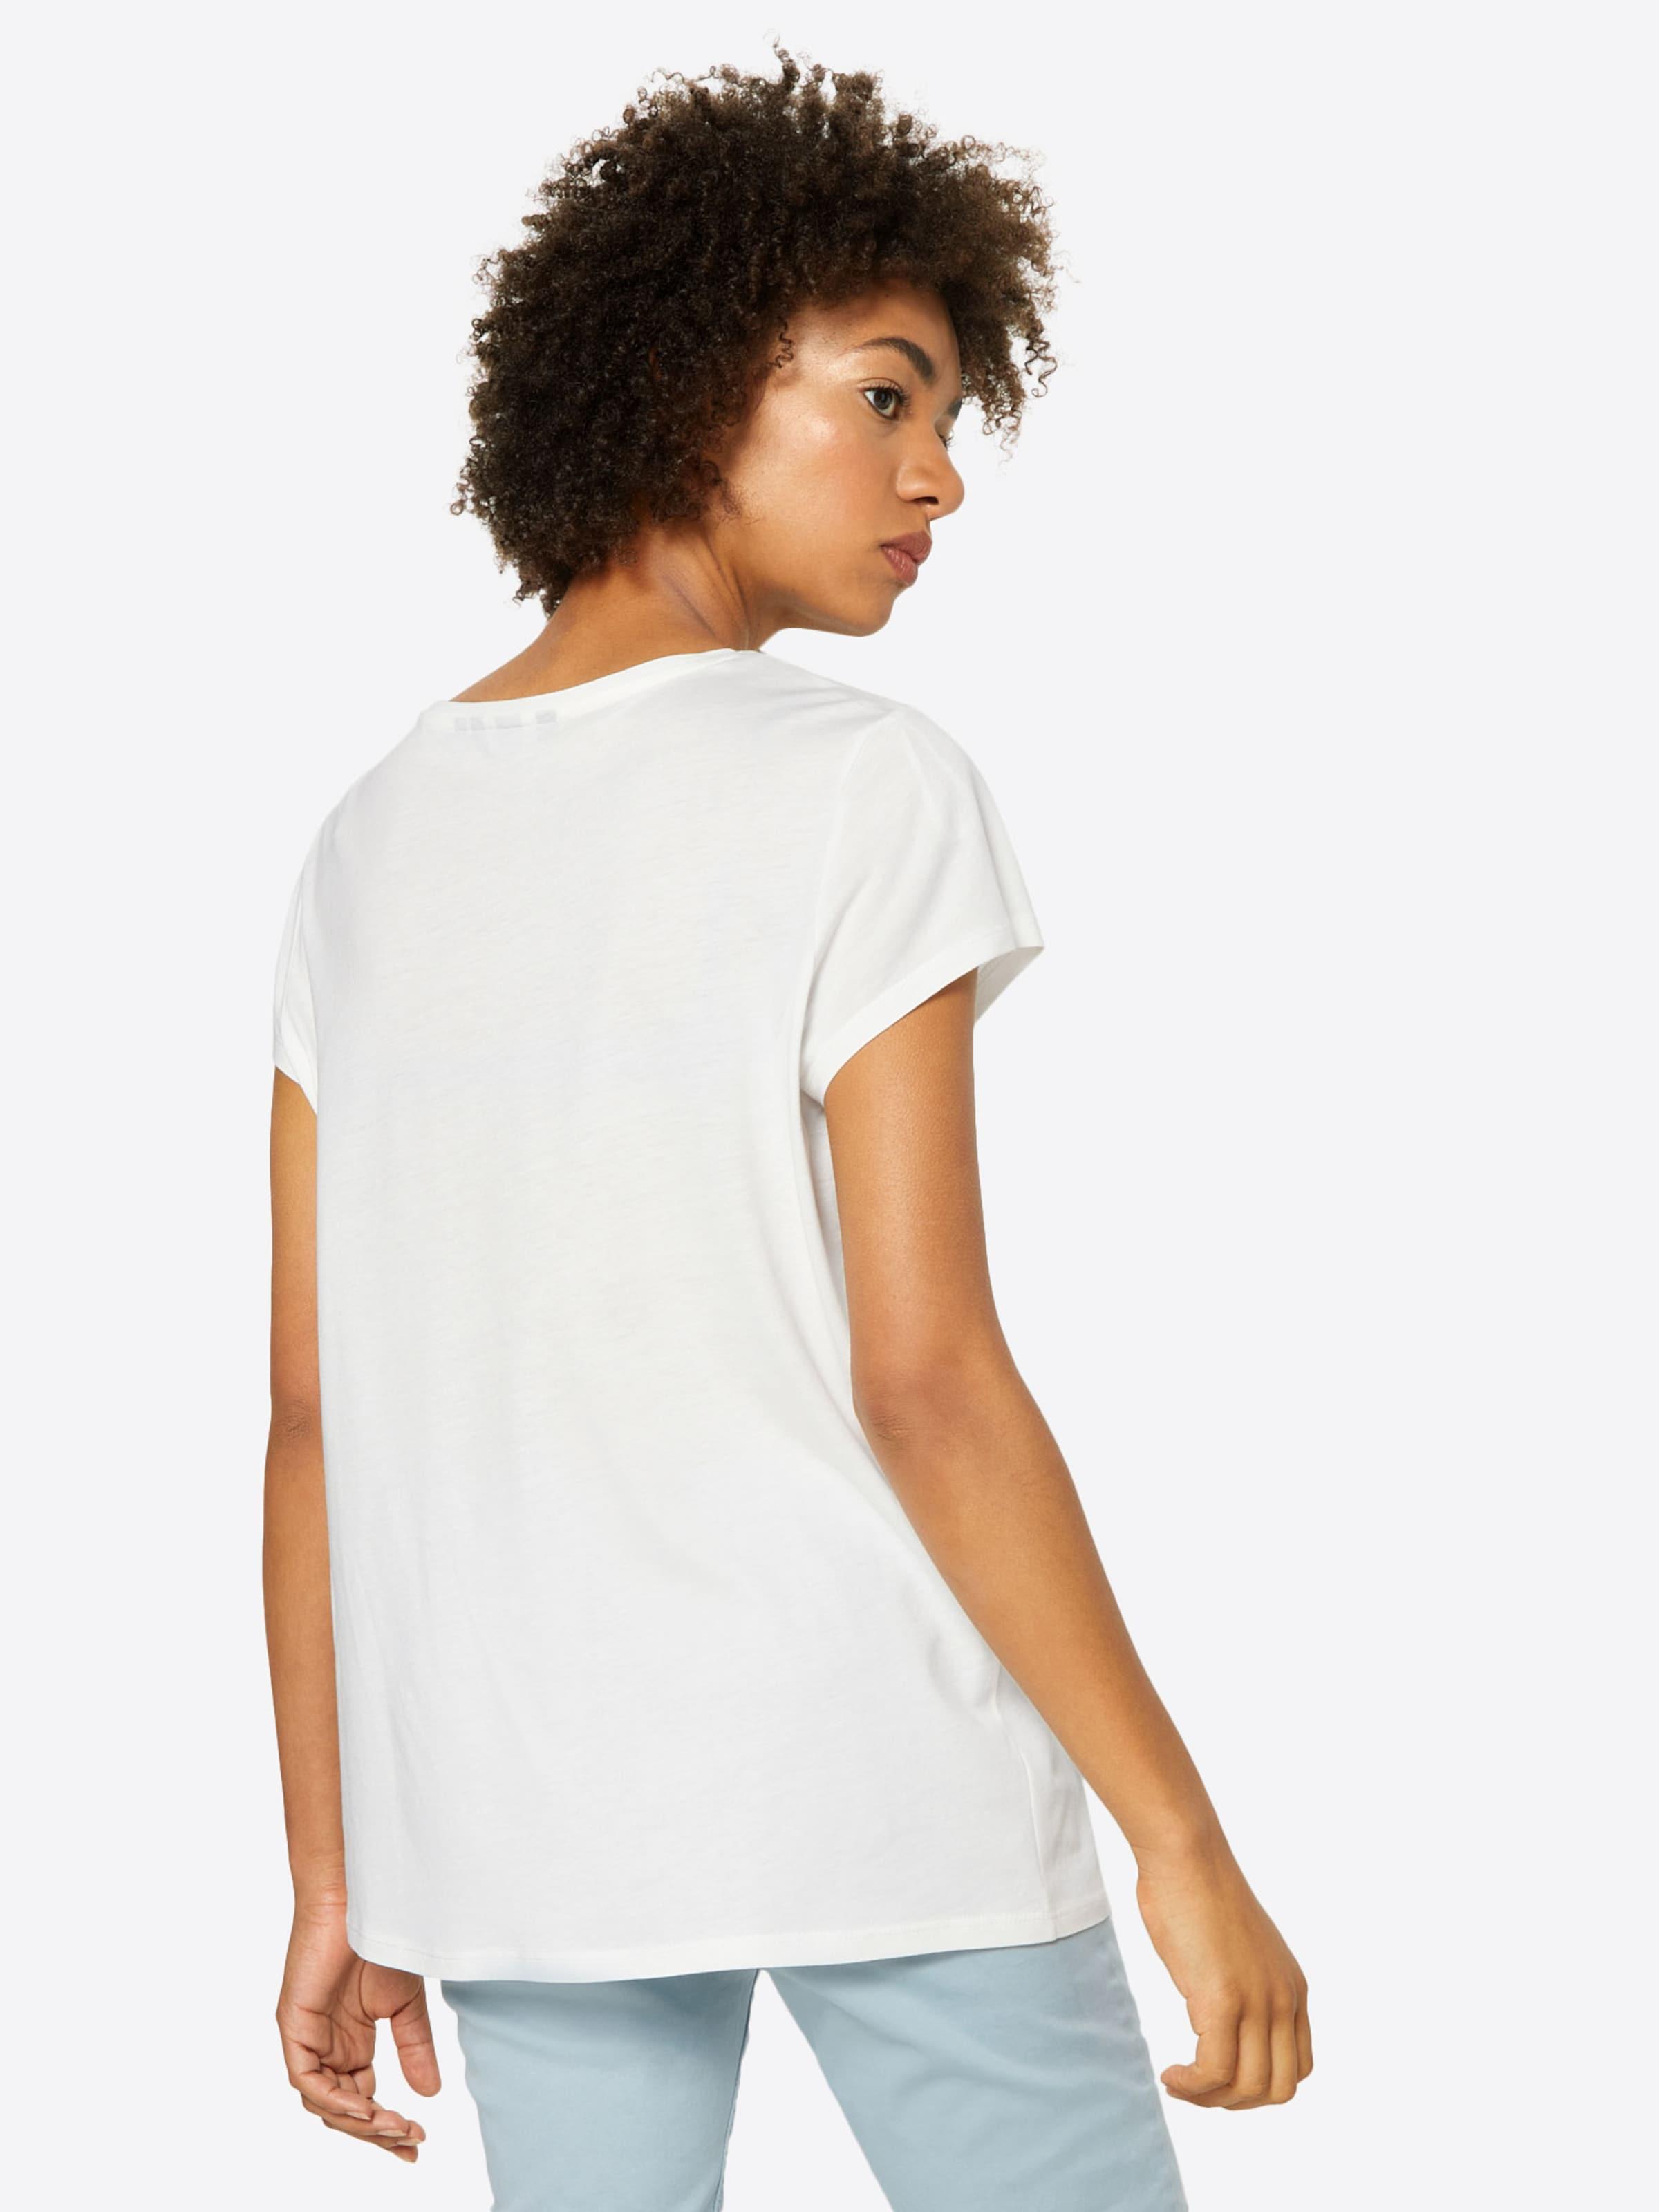 Tailor shirt T In Pearl' Offwhite Tom 'fancy 543RLAj